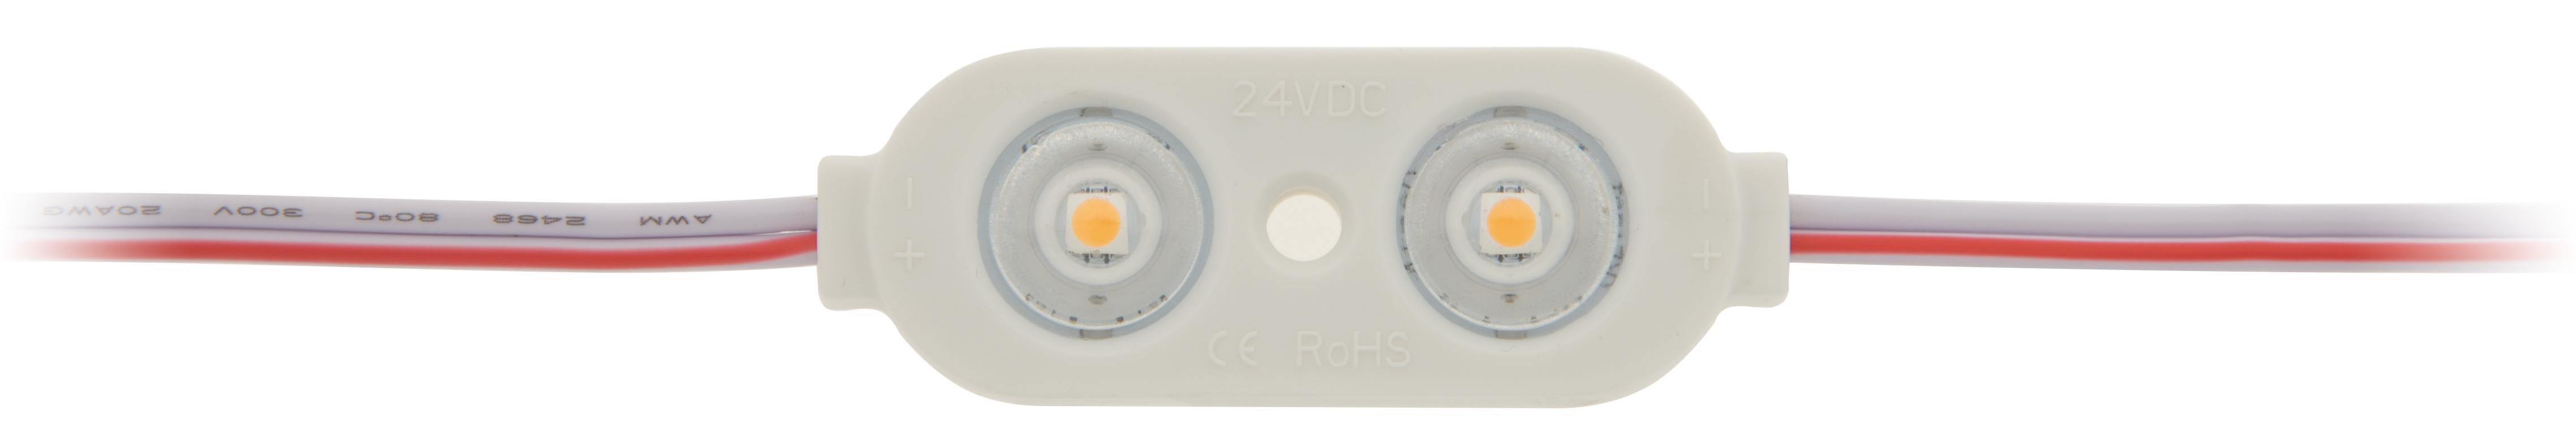 1 Stk LED Modulkette Twin 12 UWW (Ultra Warm Weiss) IP65 CRI 90+ LIMK002001